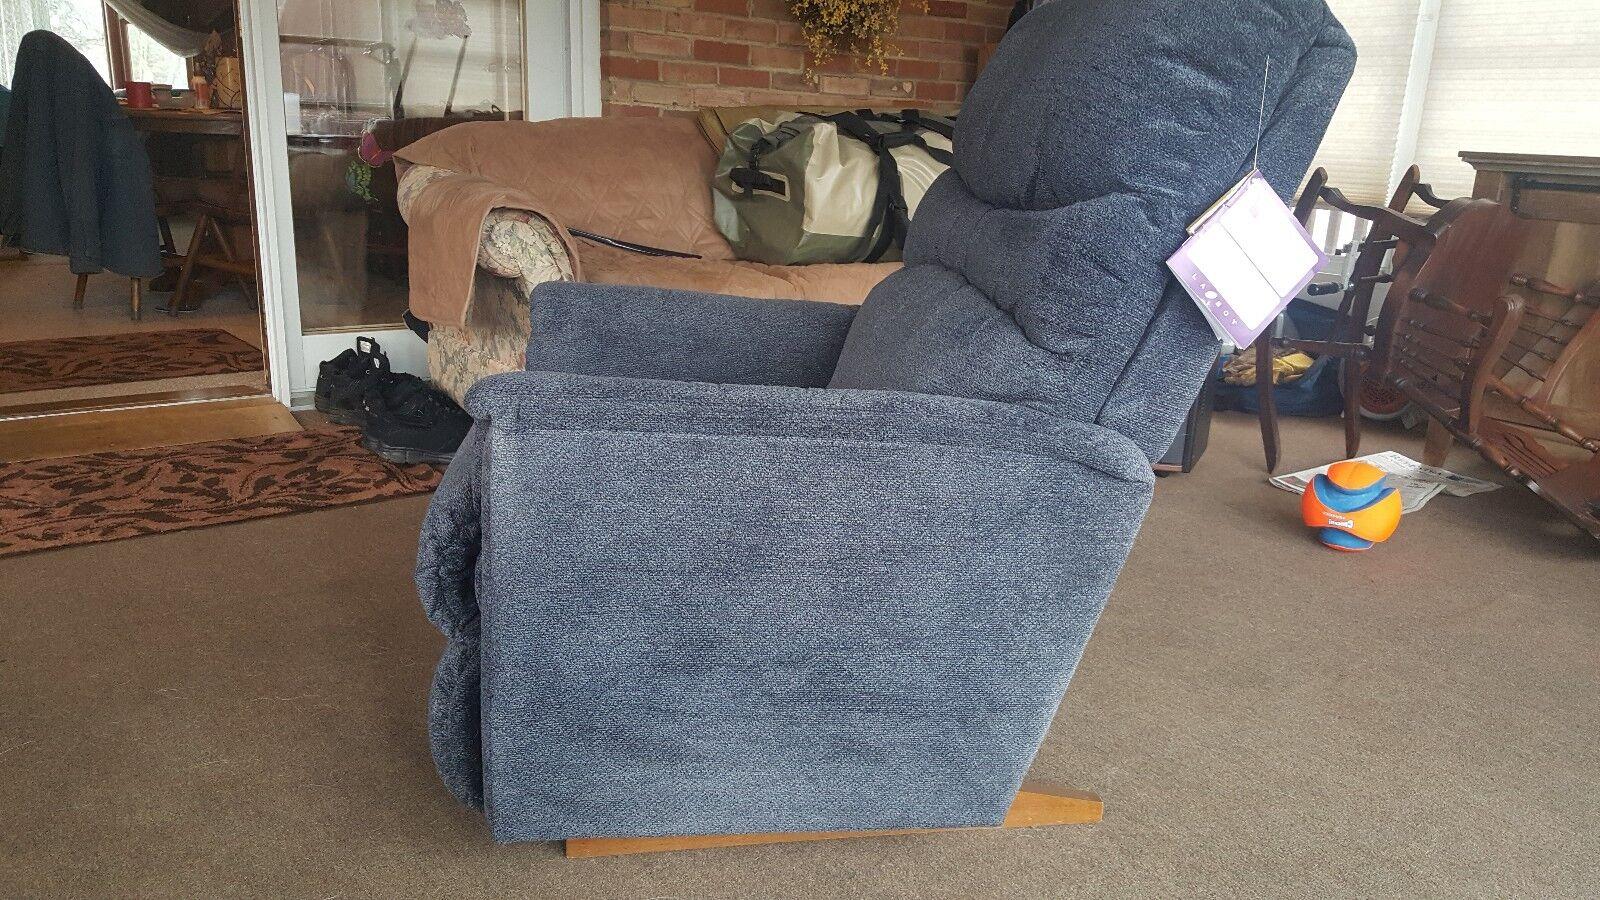 lazy boy power rocker recliner xr Brand new for medium size